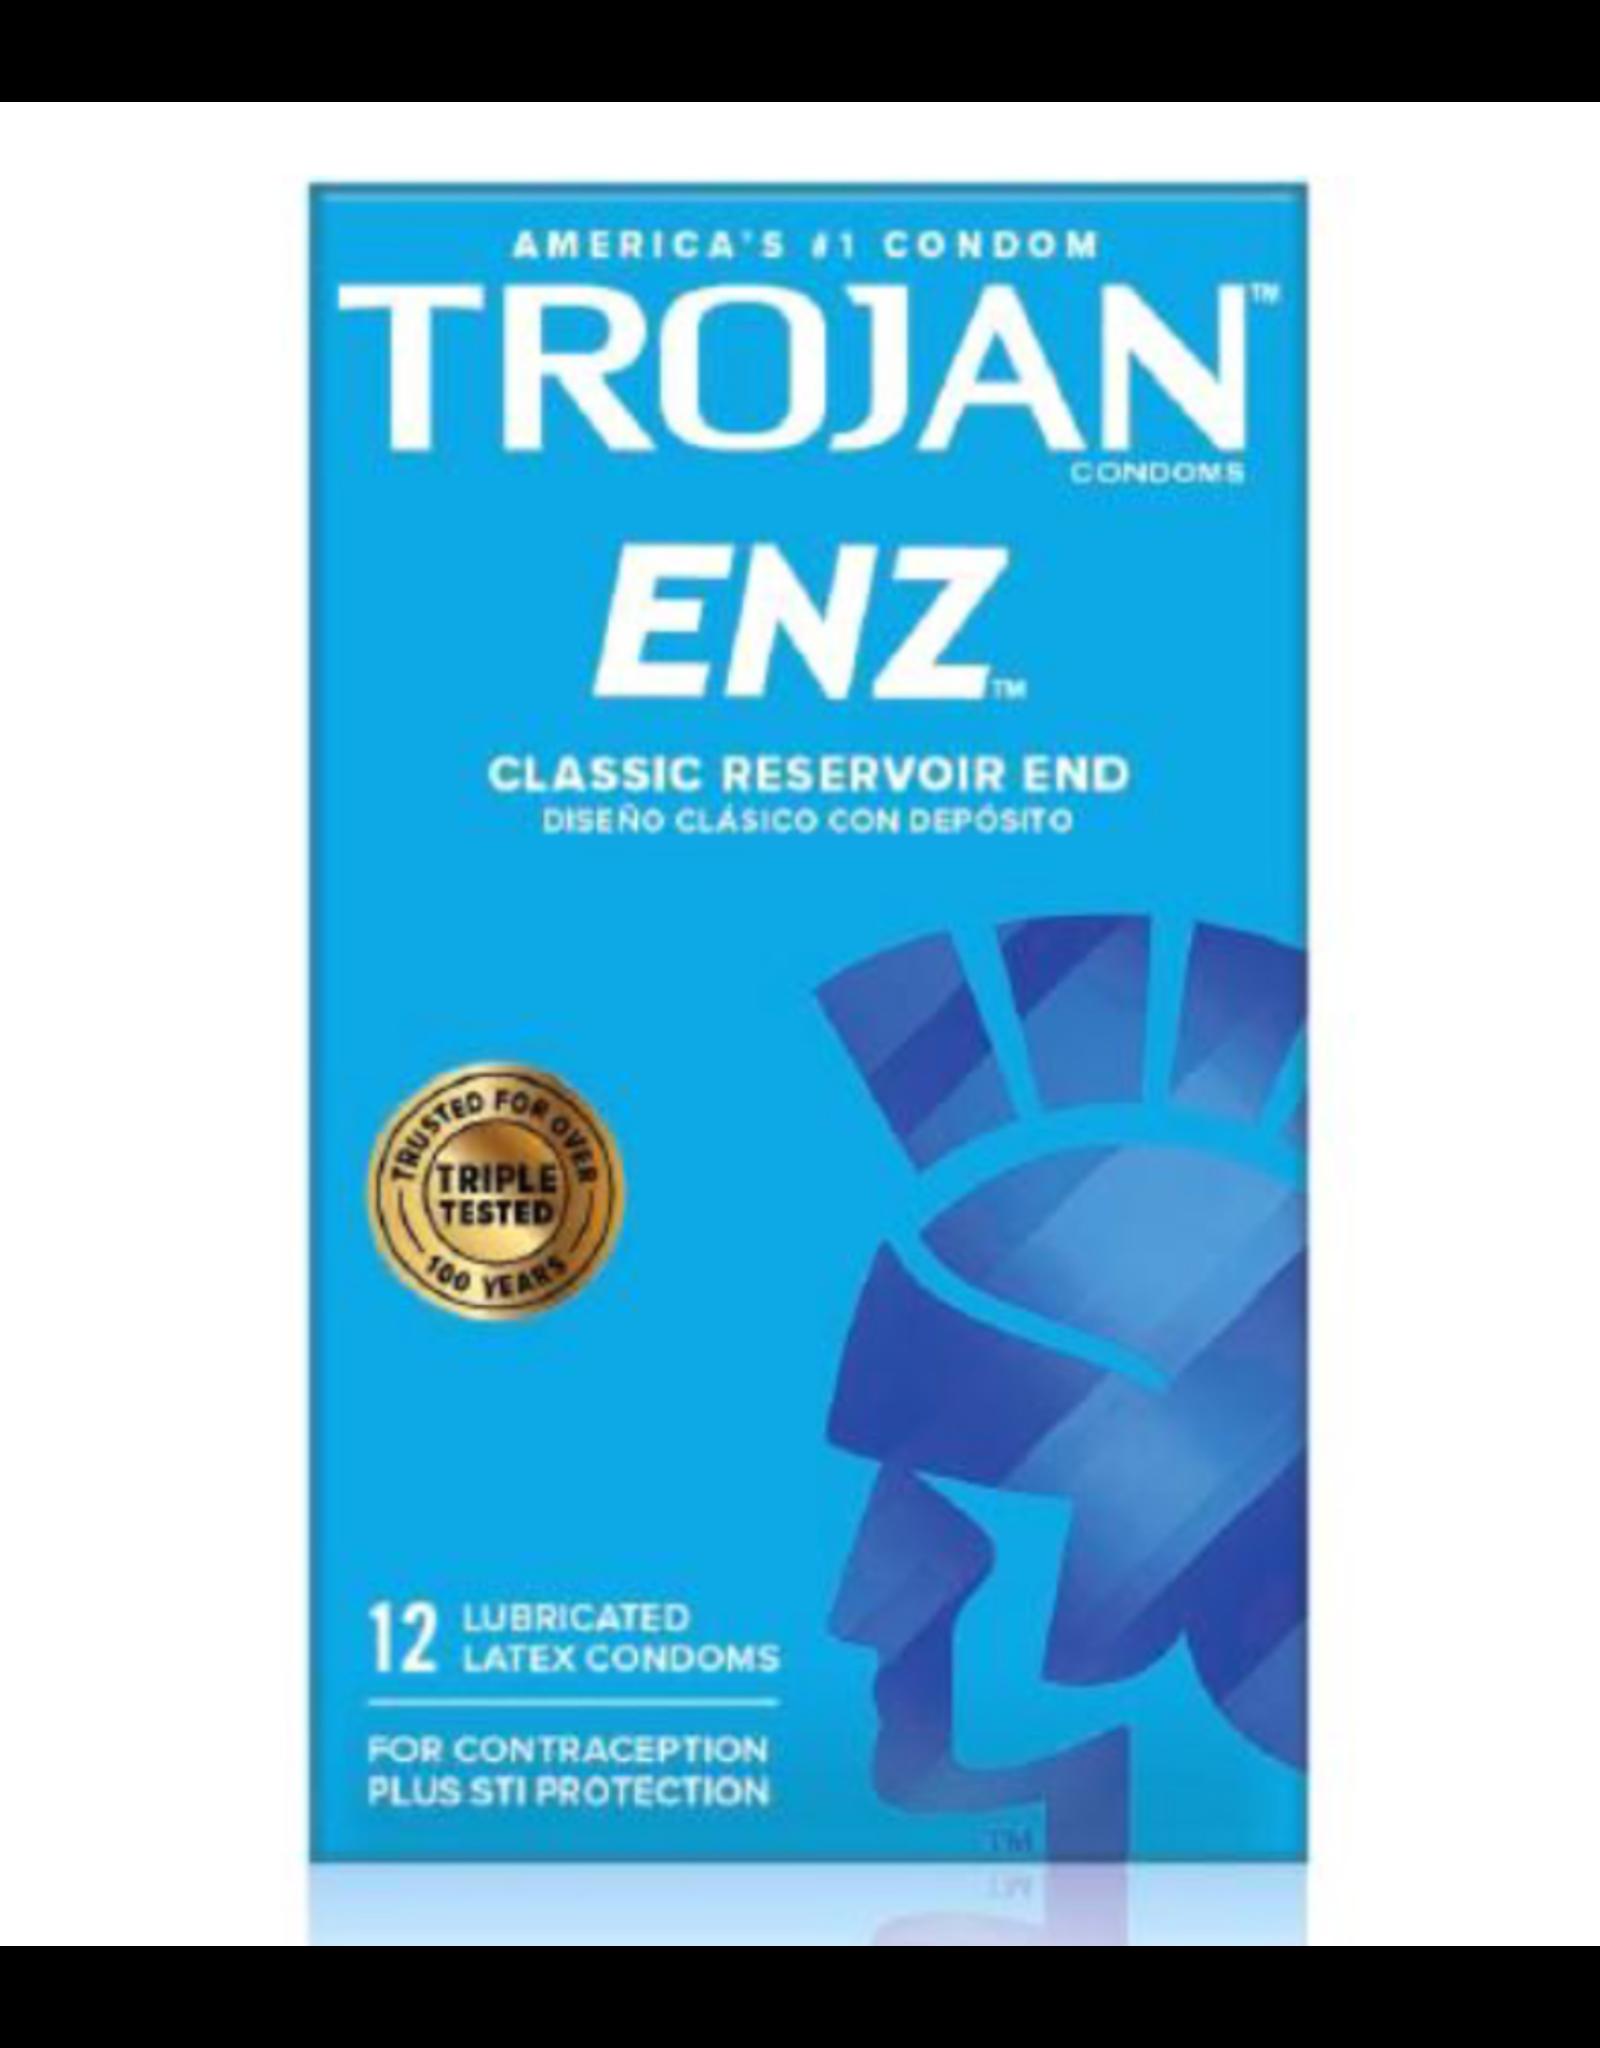 Trojan Enz Lubricated Condoms 12pk